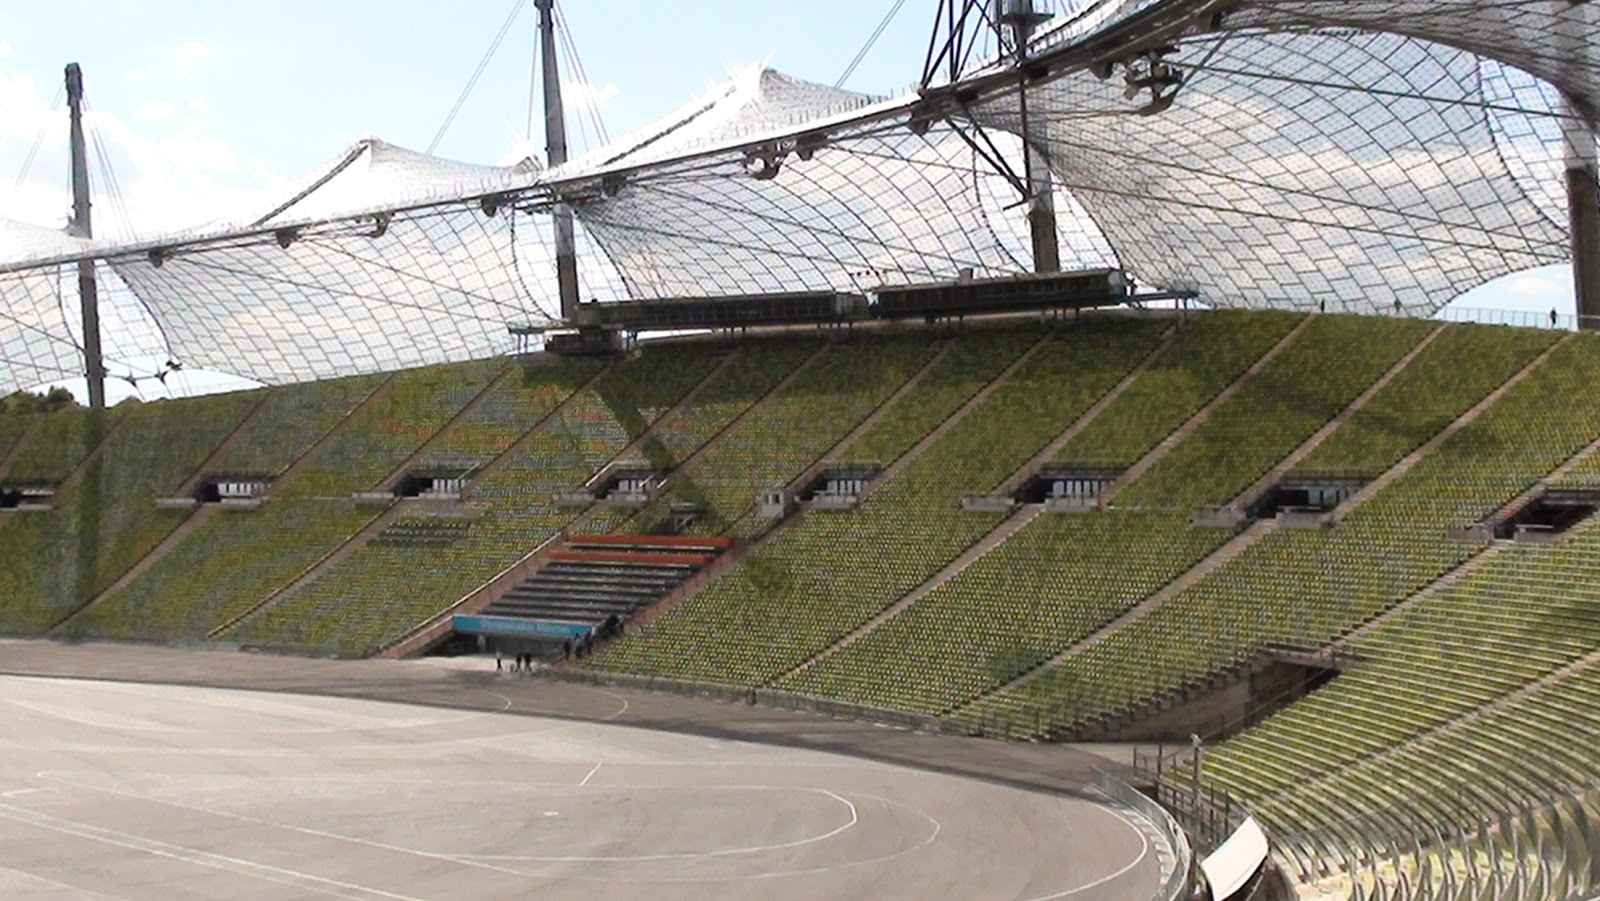 Müncheni Olimpiai Stadion